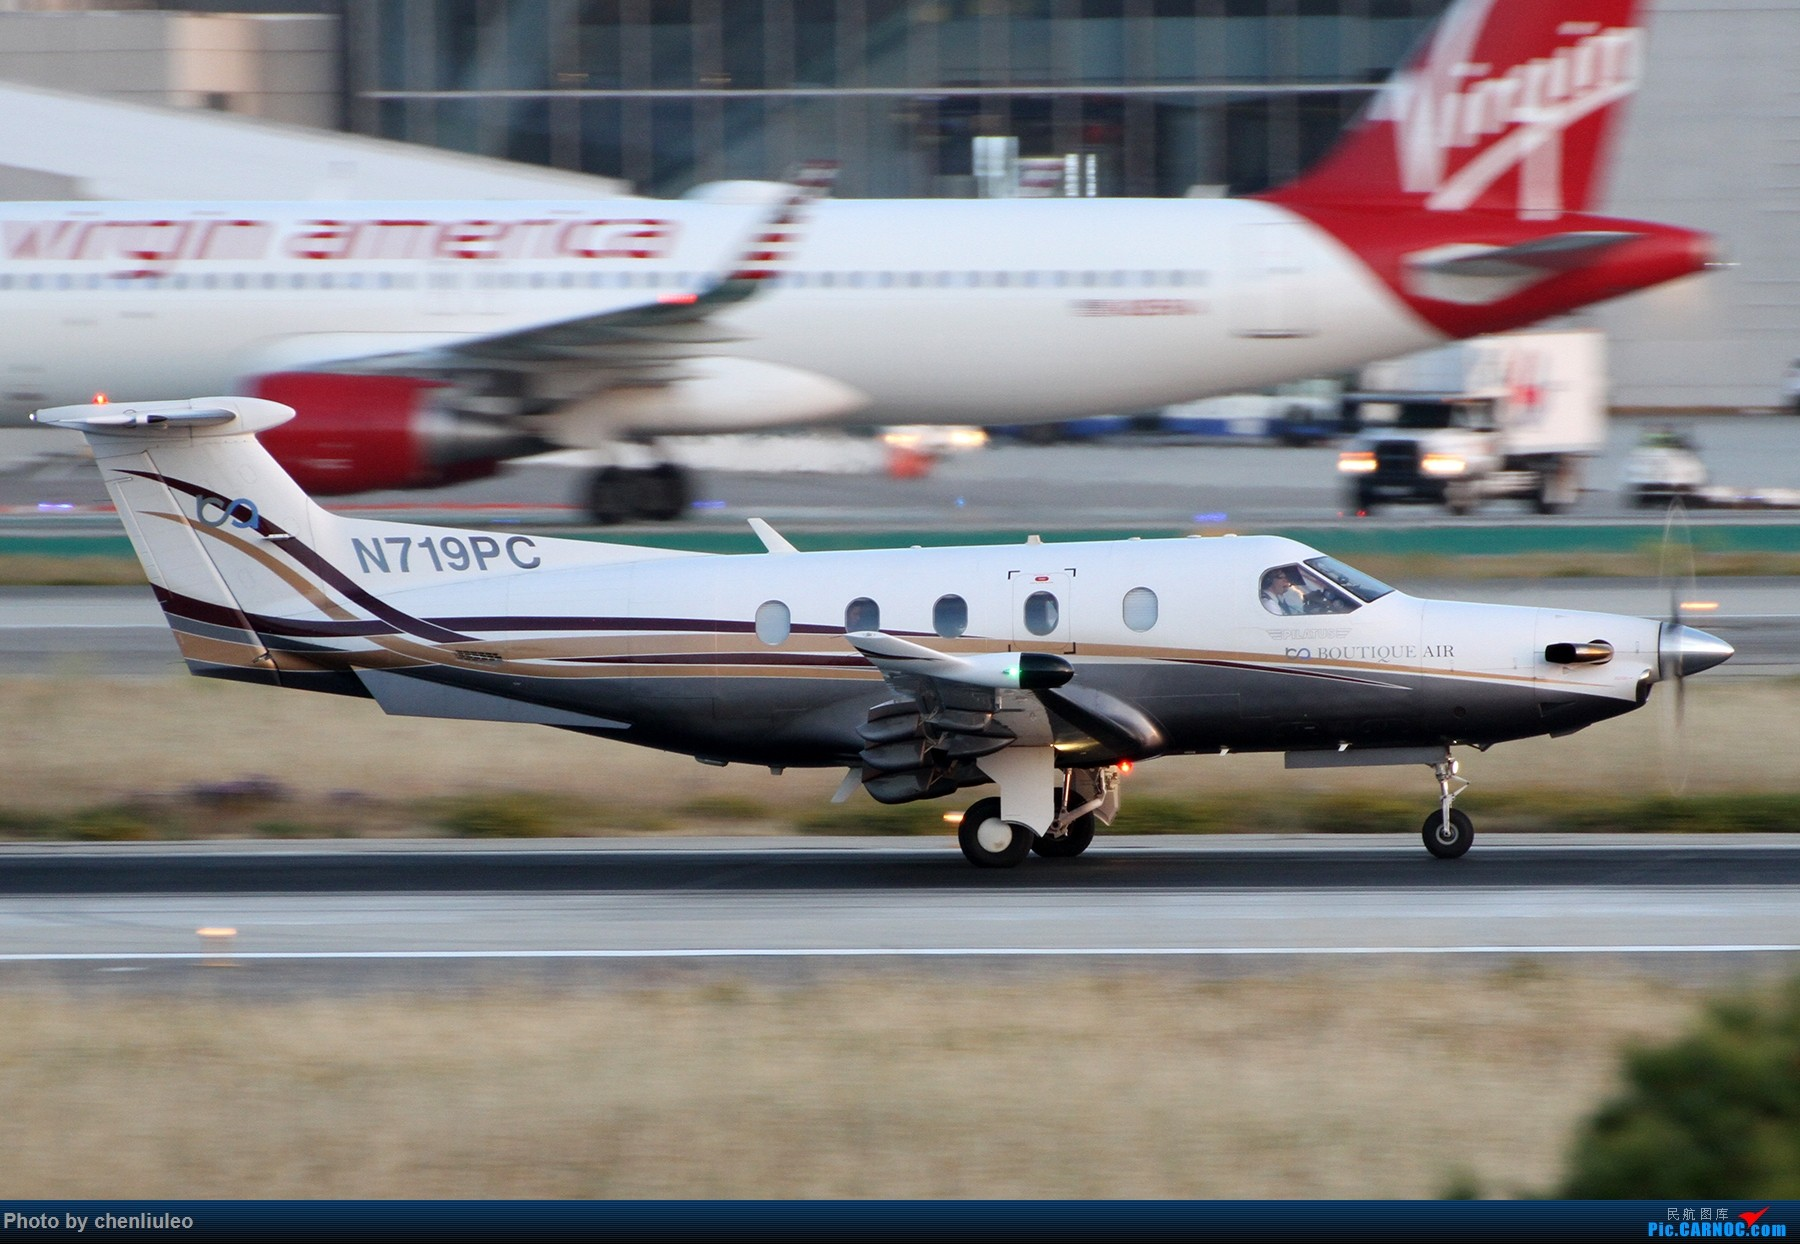 Re:[原创]【北美飞友会】洛杉矶世界机场黄昏随拍 PILATUS PC-12/47E N719PC 美国洛杉矶机场